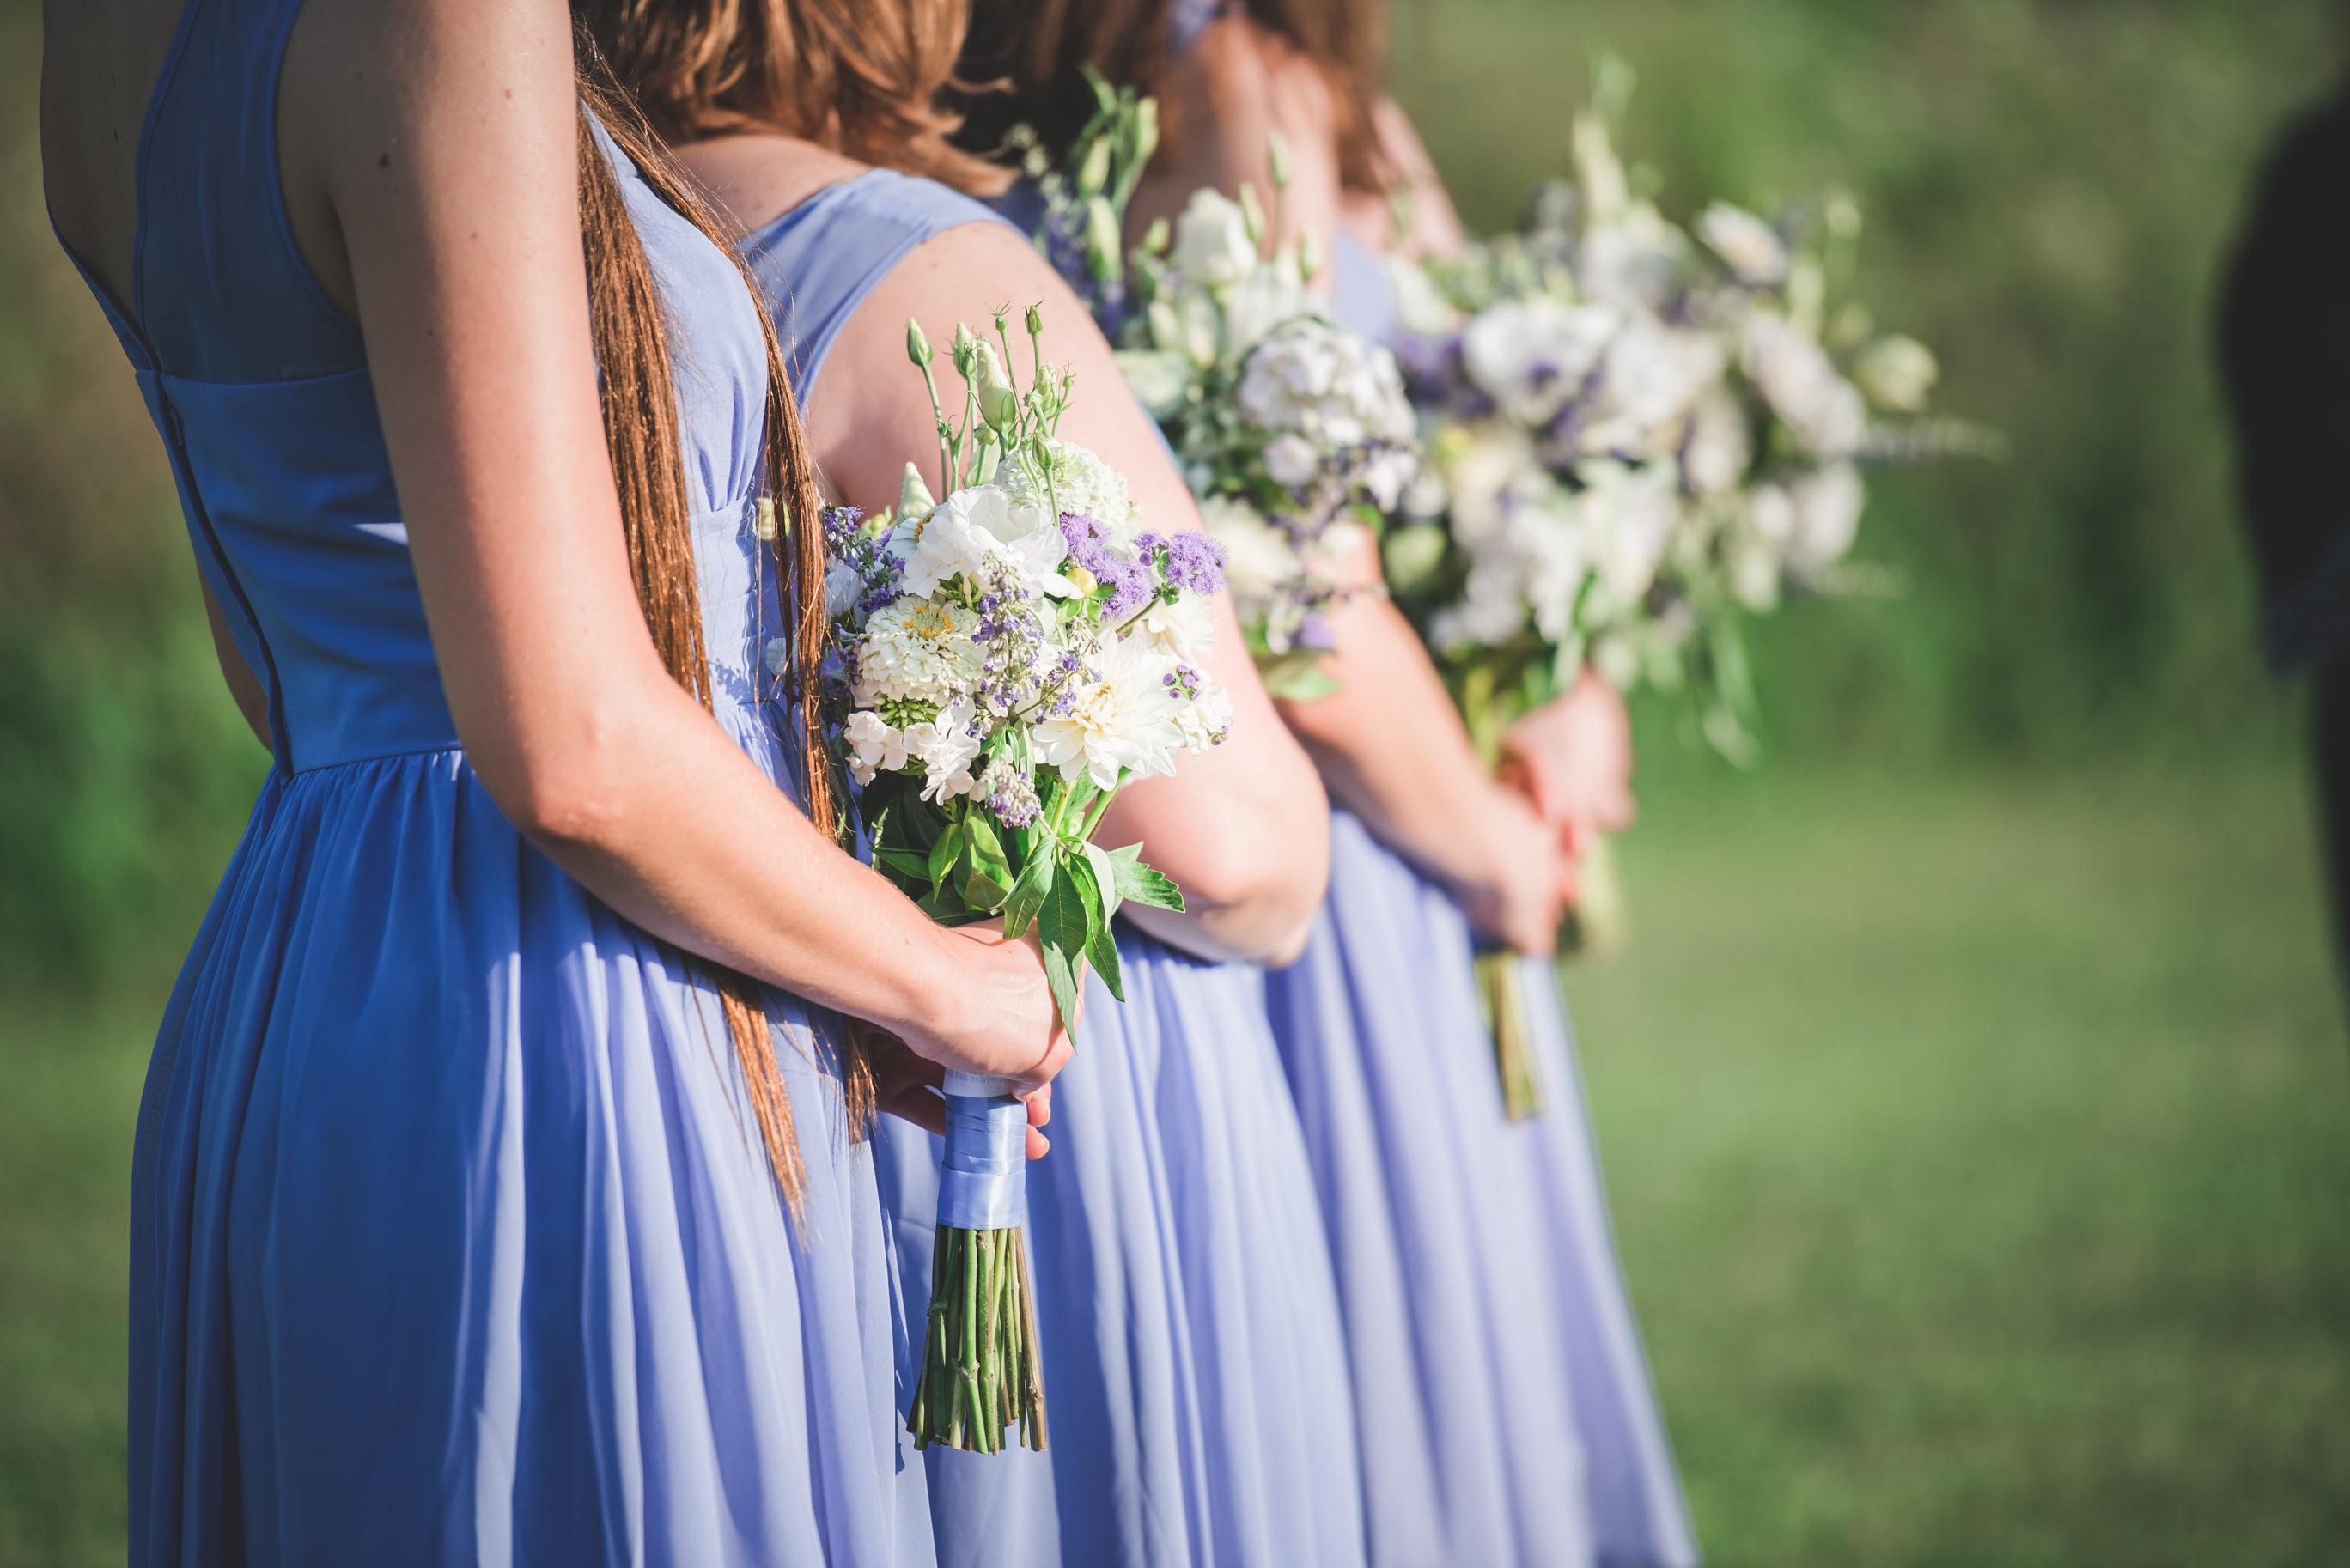 khimaira-farm-wedding-virginia-55